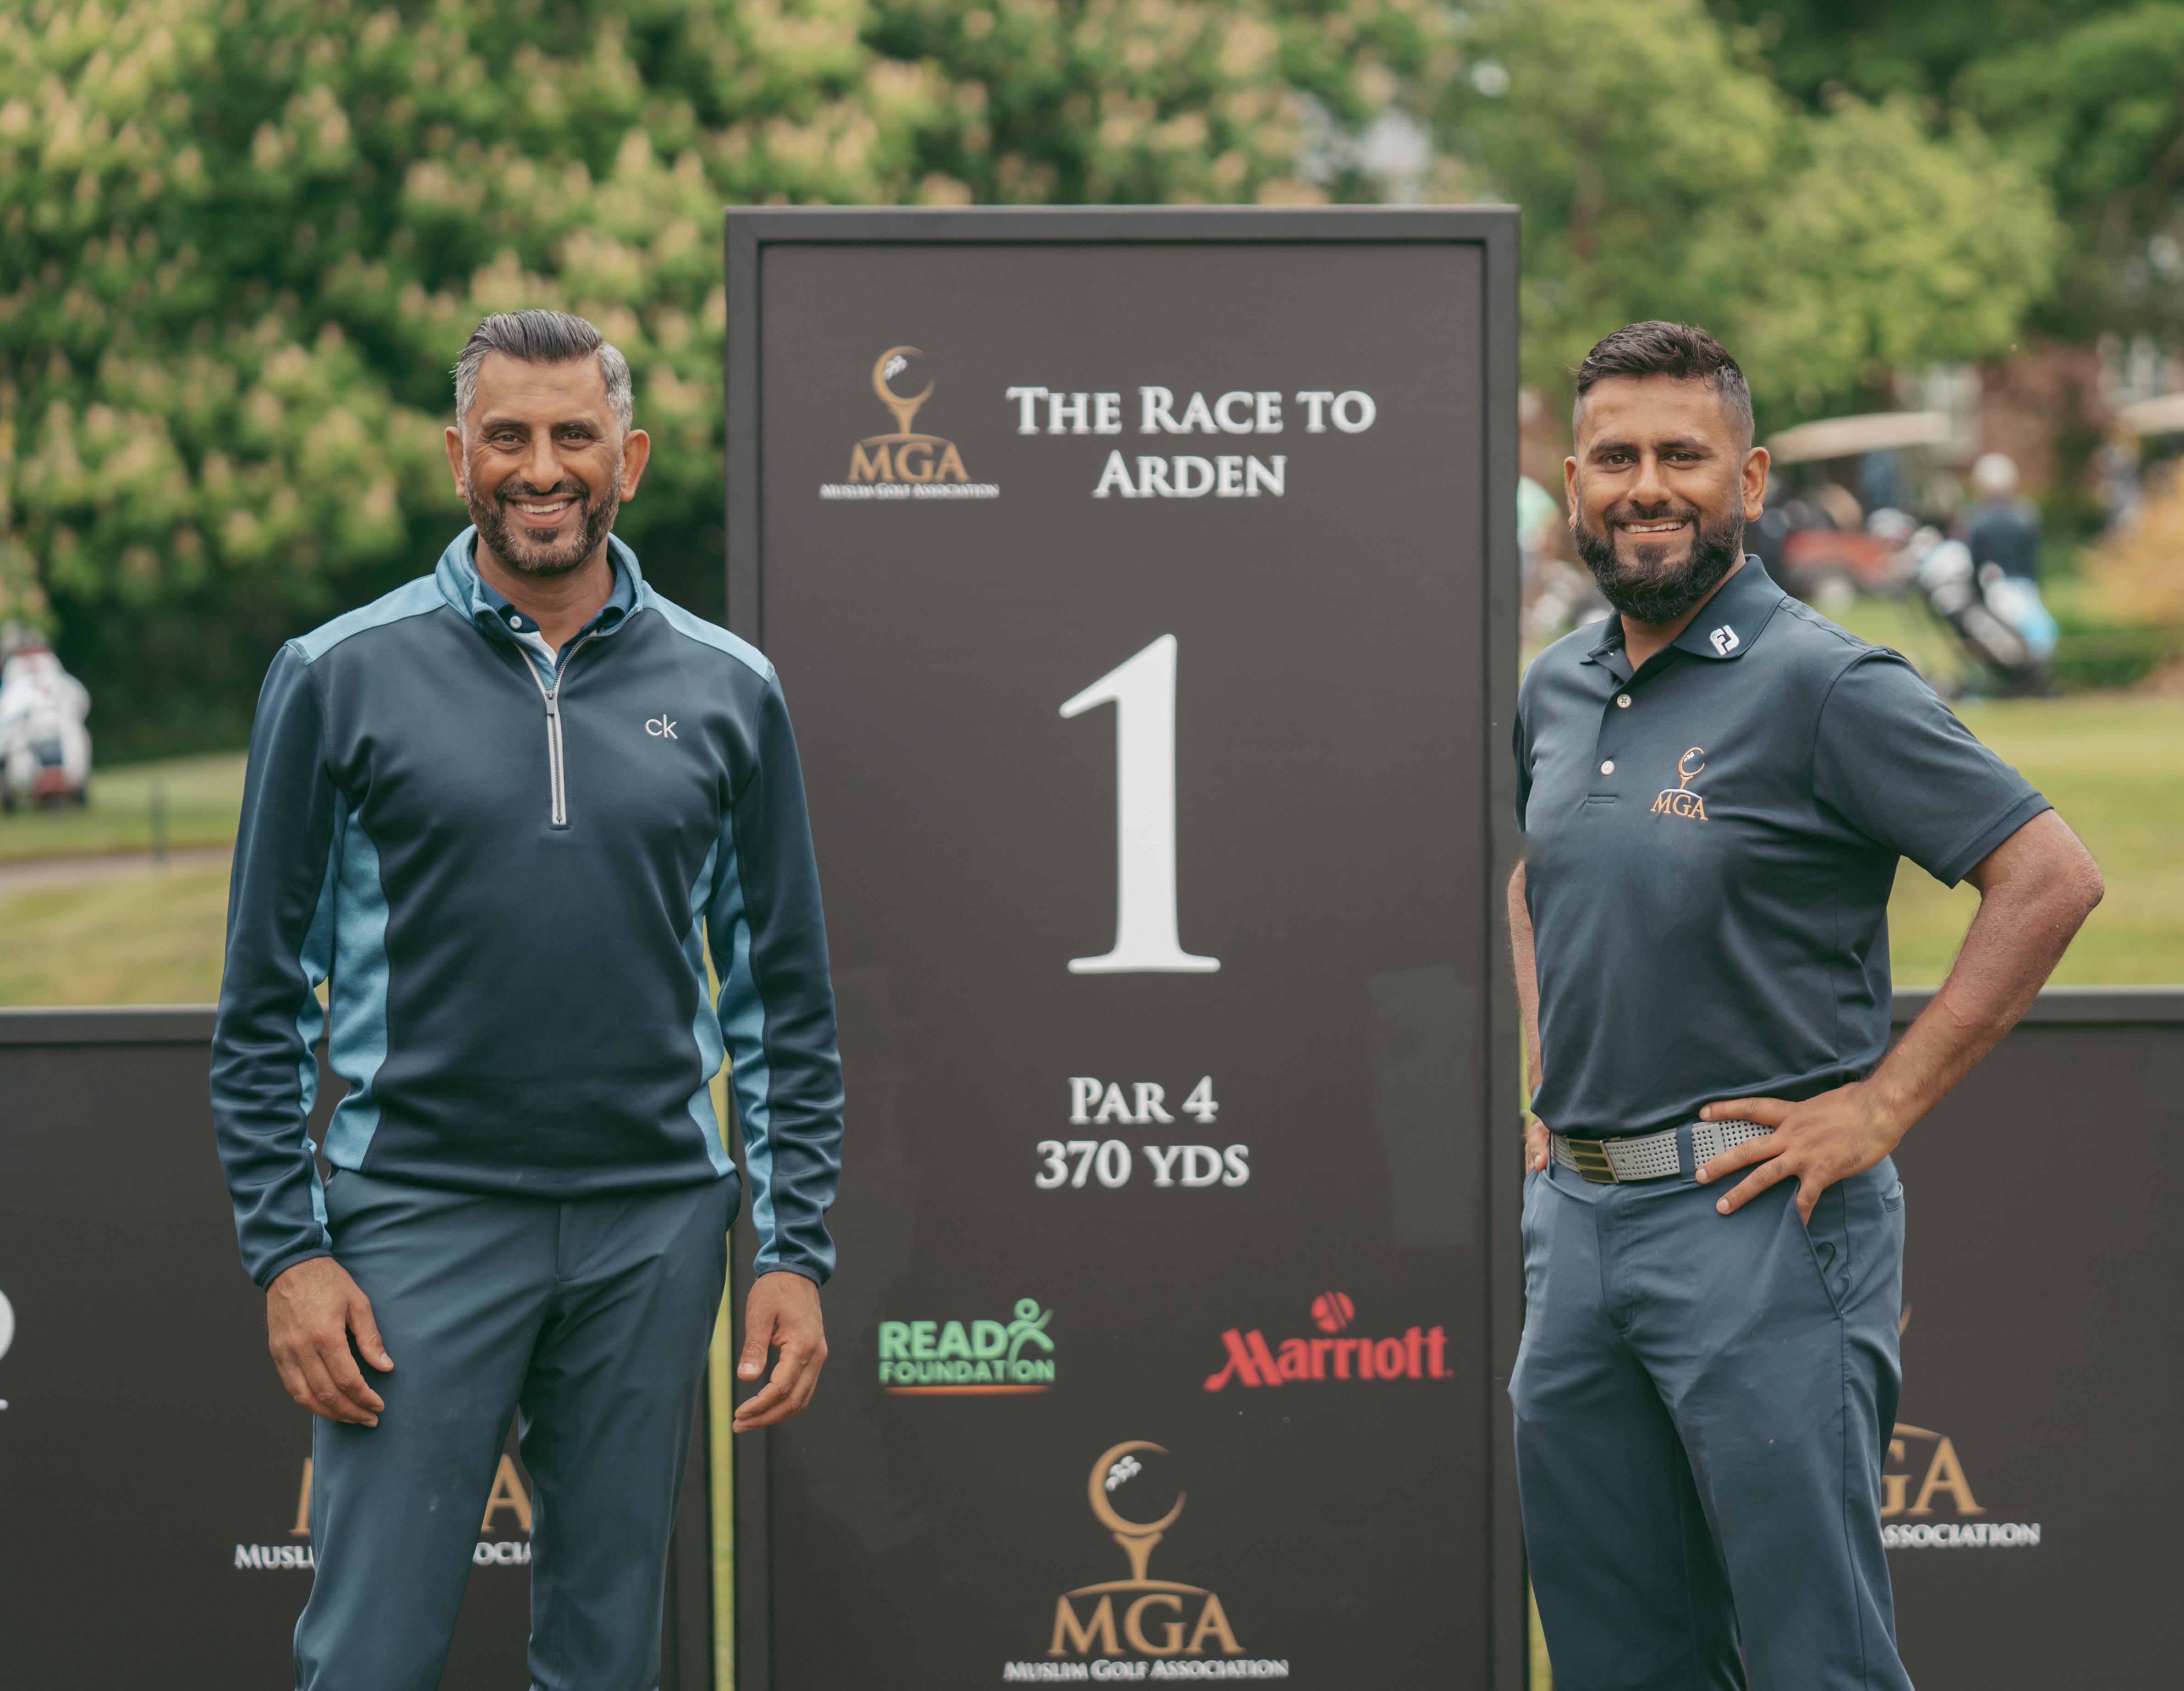 the Muslim Golf Association